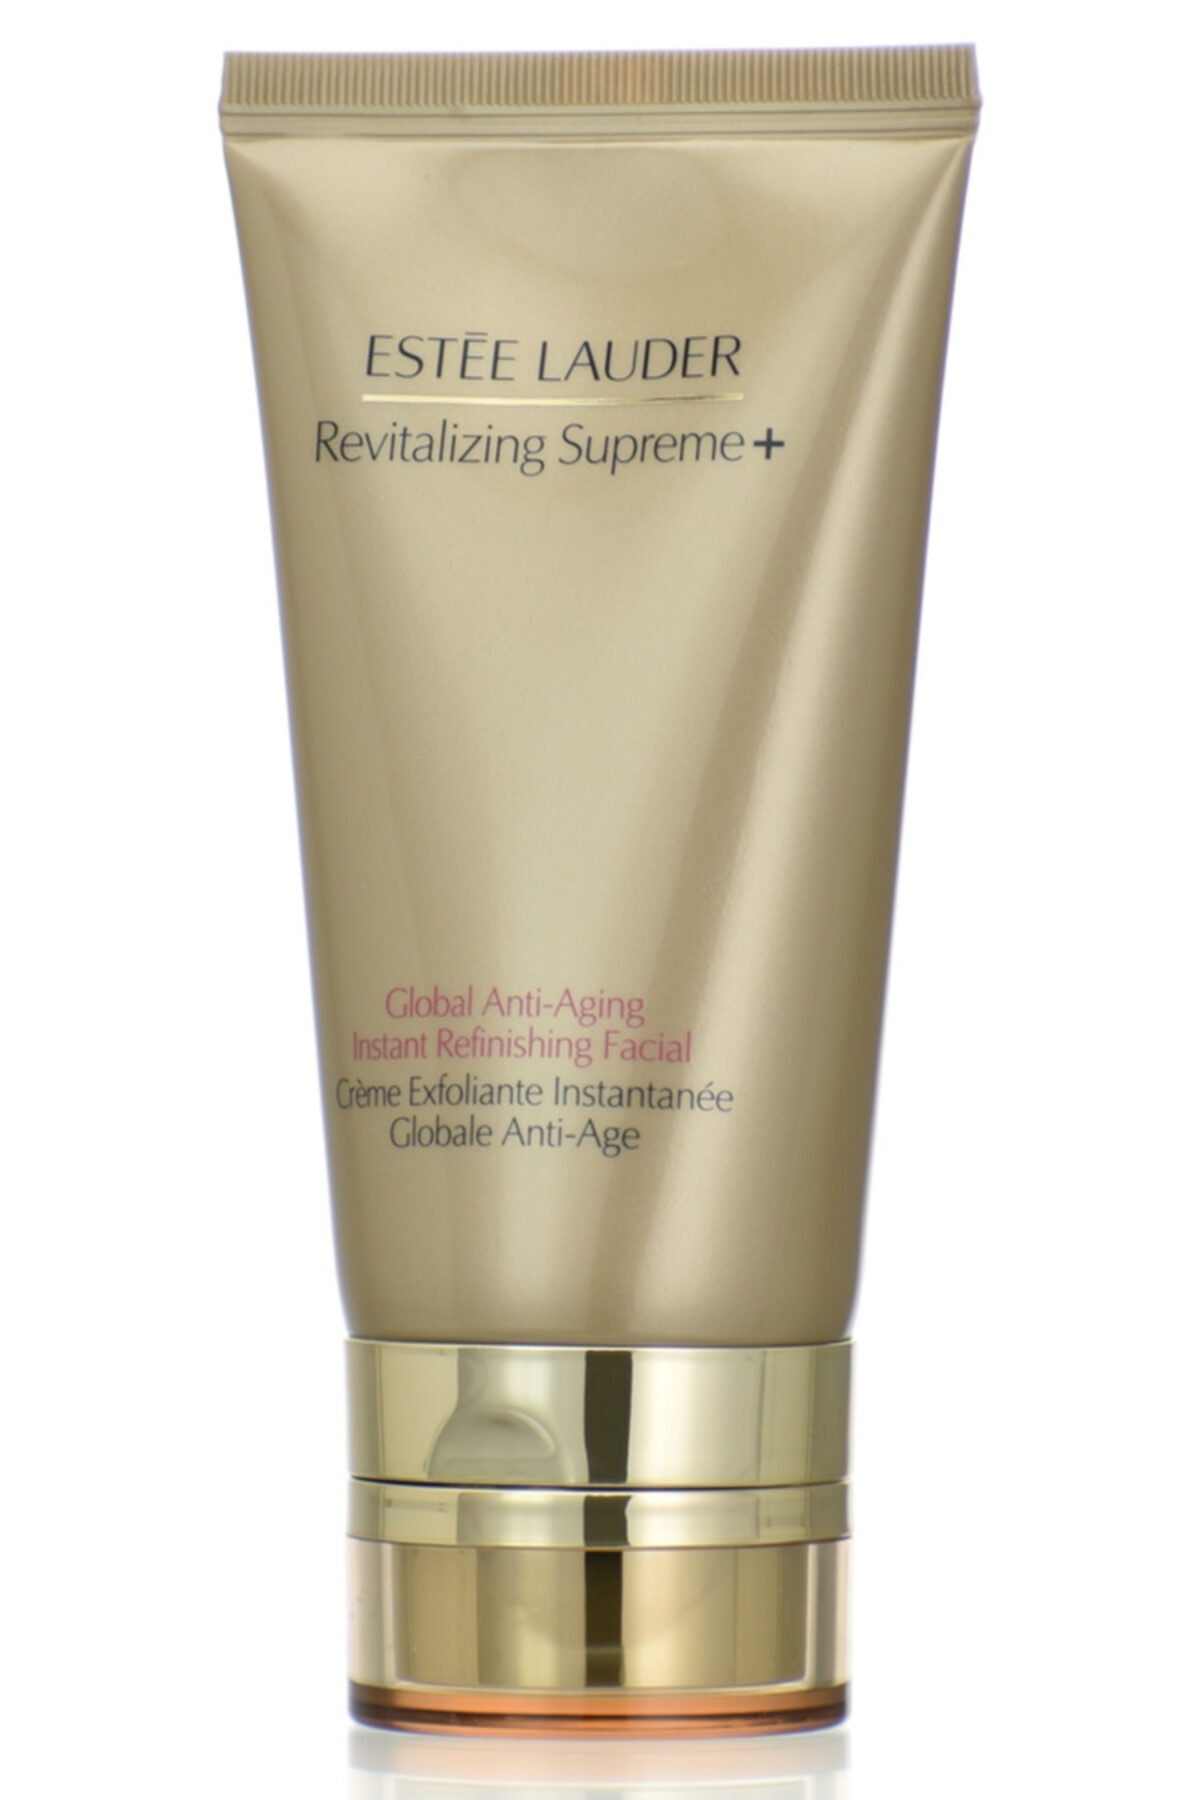 Estee Lauder Revitalizing Supreme+ Flash Facial Peeling 75ml. 1